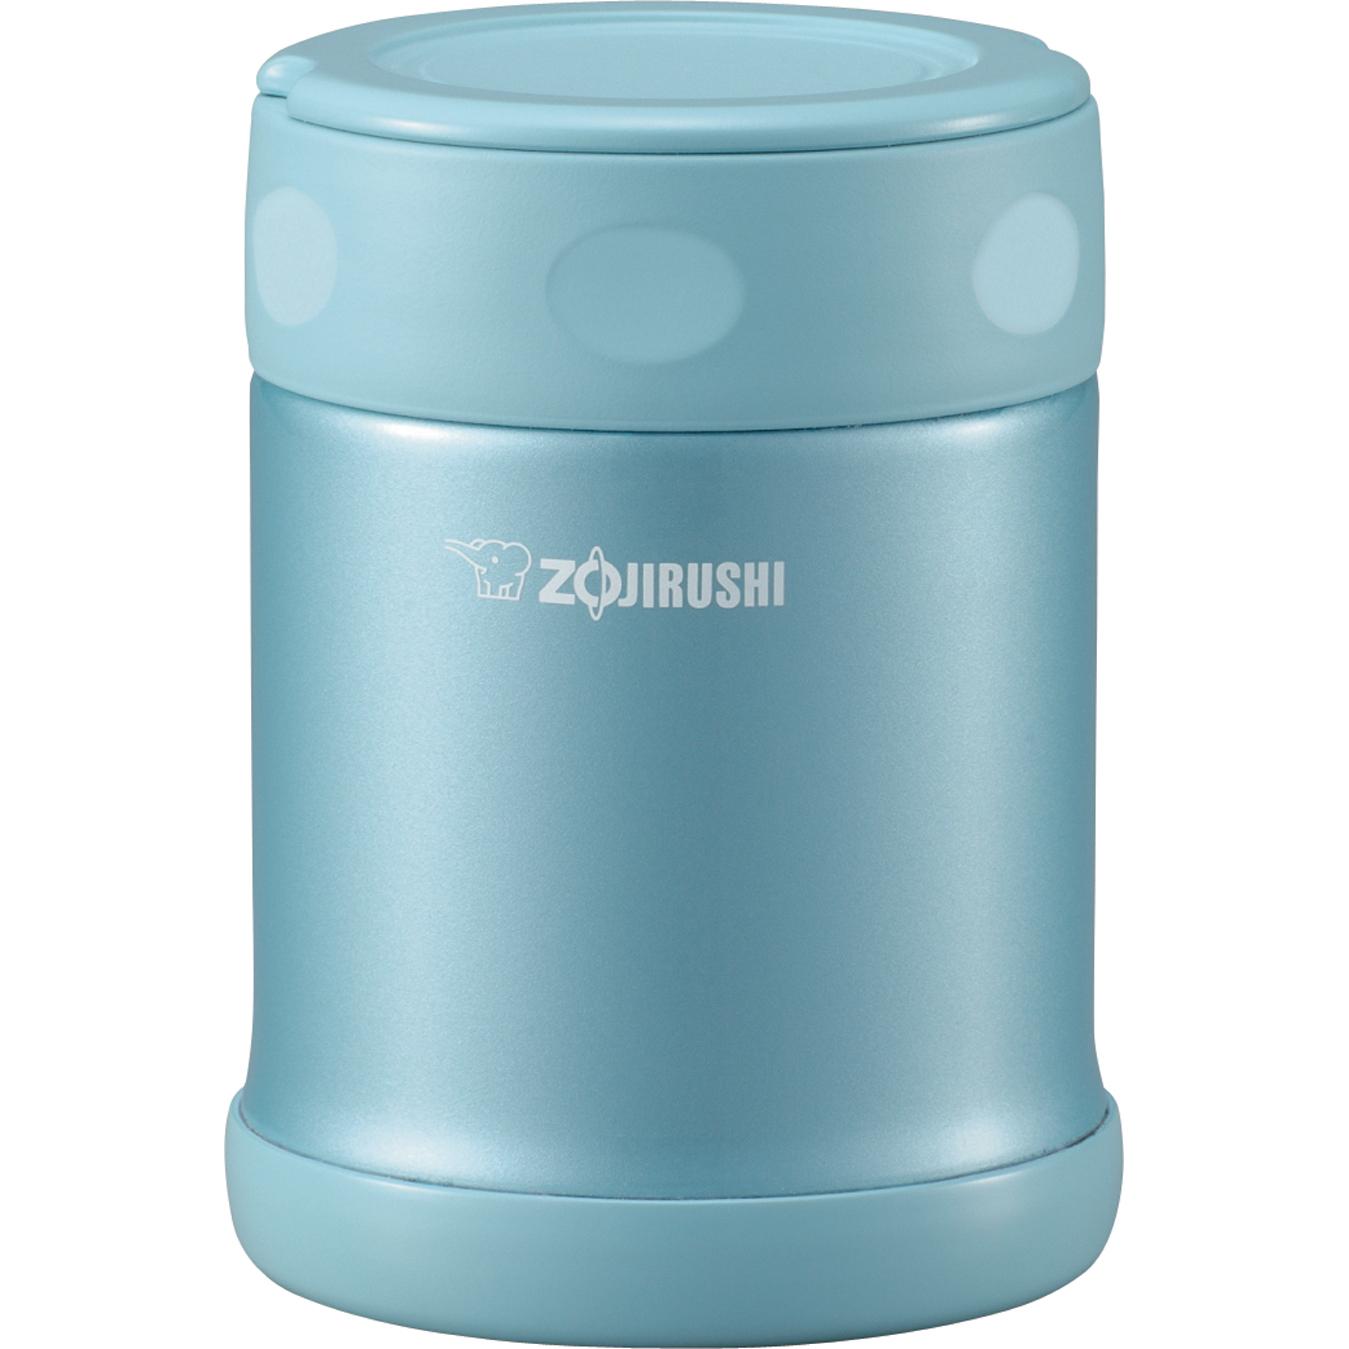 Zojirushi Aqua Blue 18/8 Stainless Steel Food Jar, 12 Ounce